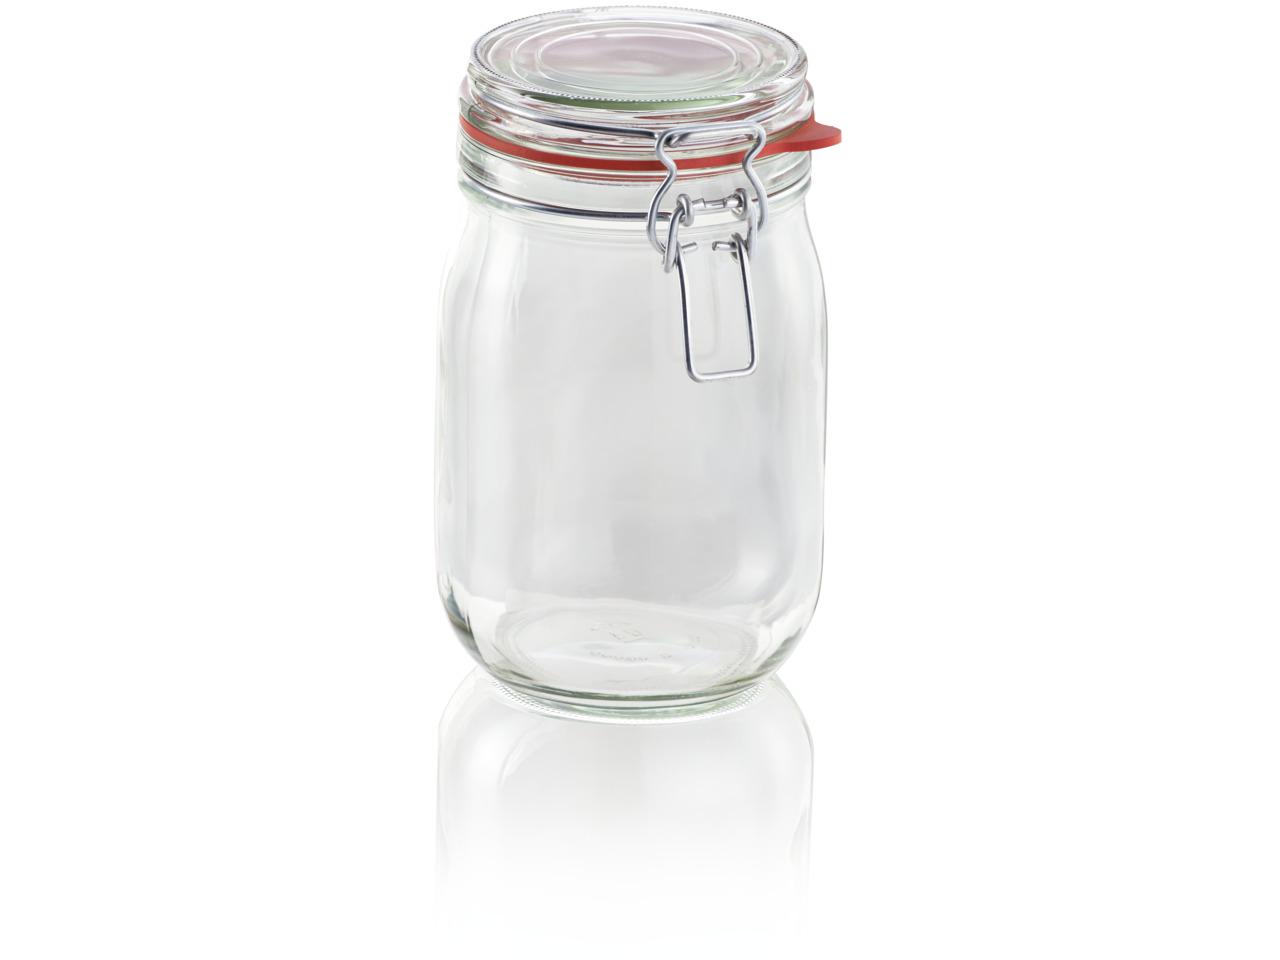 LEIFHEIT 3190 Clip top jar 135 ml